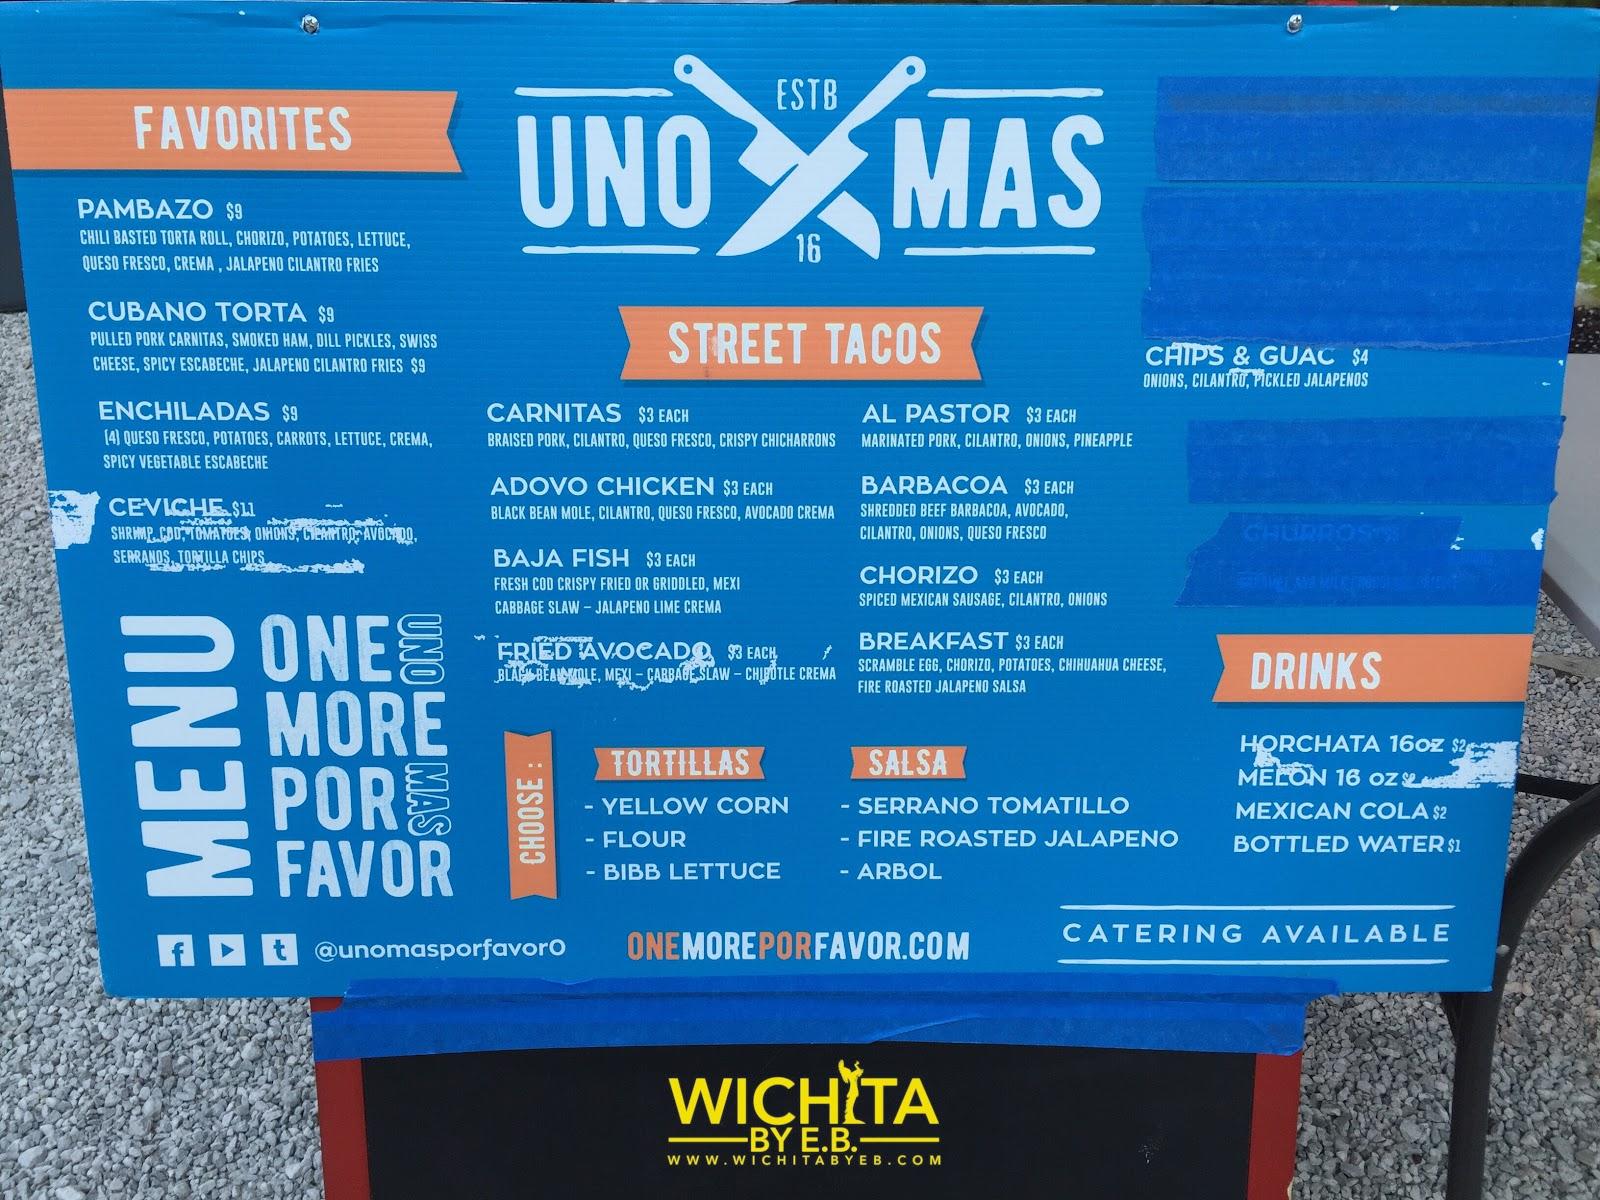 Food Truck: Uno Mas Review – Wichita By E.B.